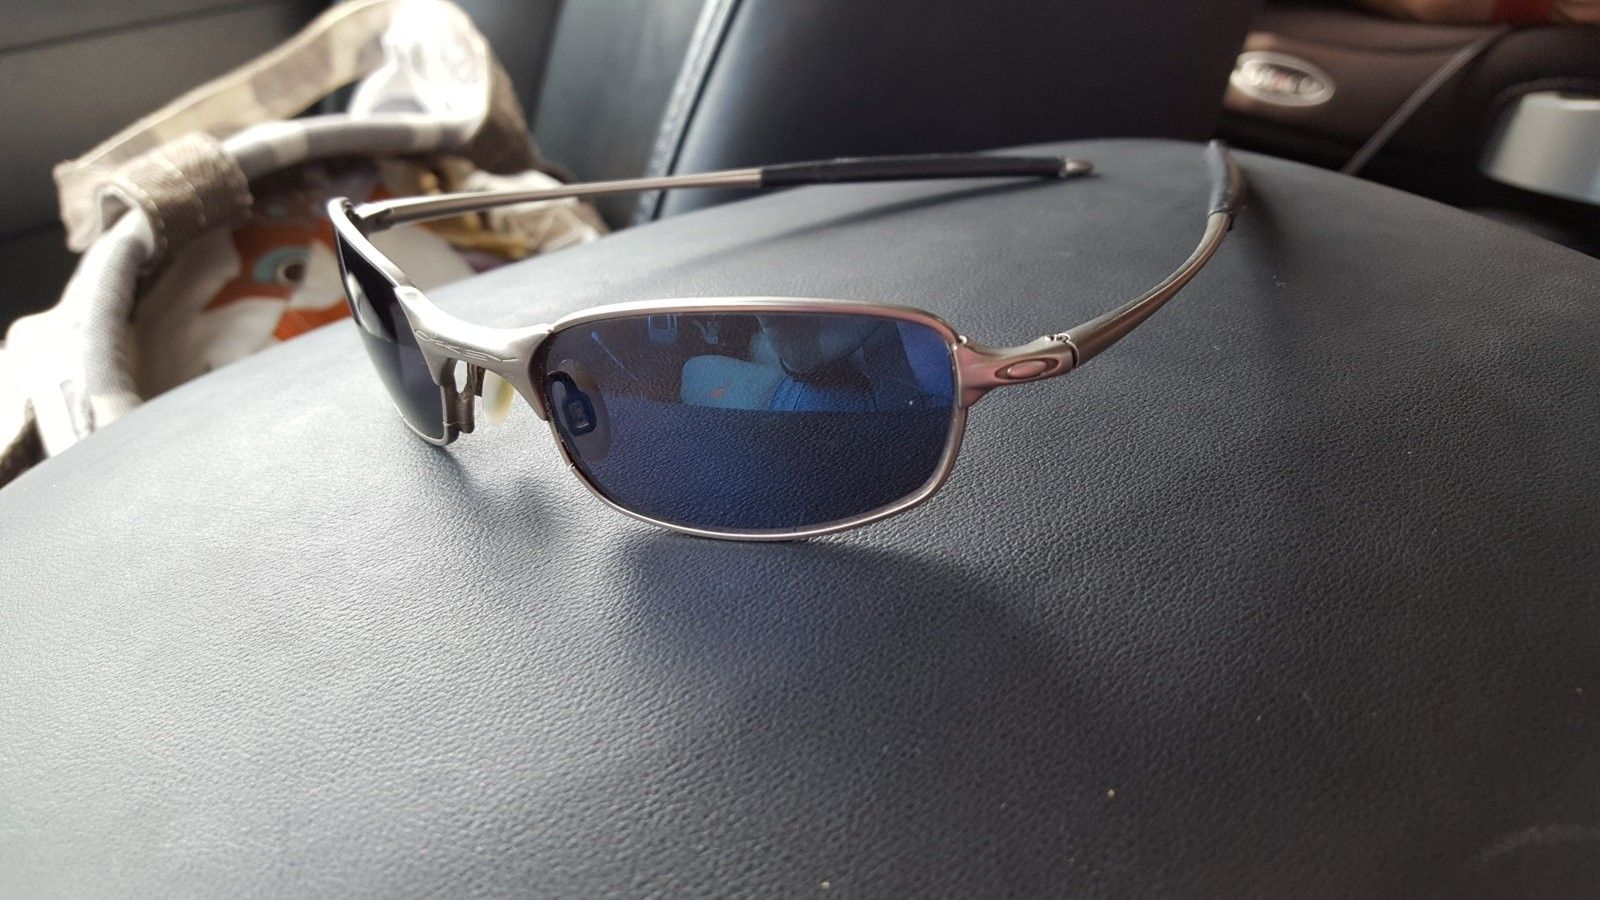 Old pair of Oakley Sunglasses - 1468862220132-516612237.jpg